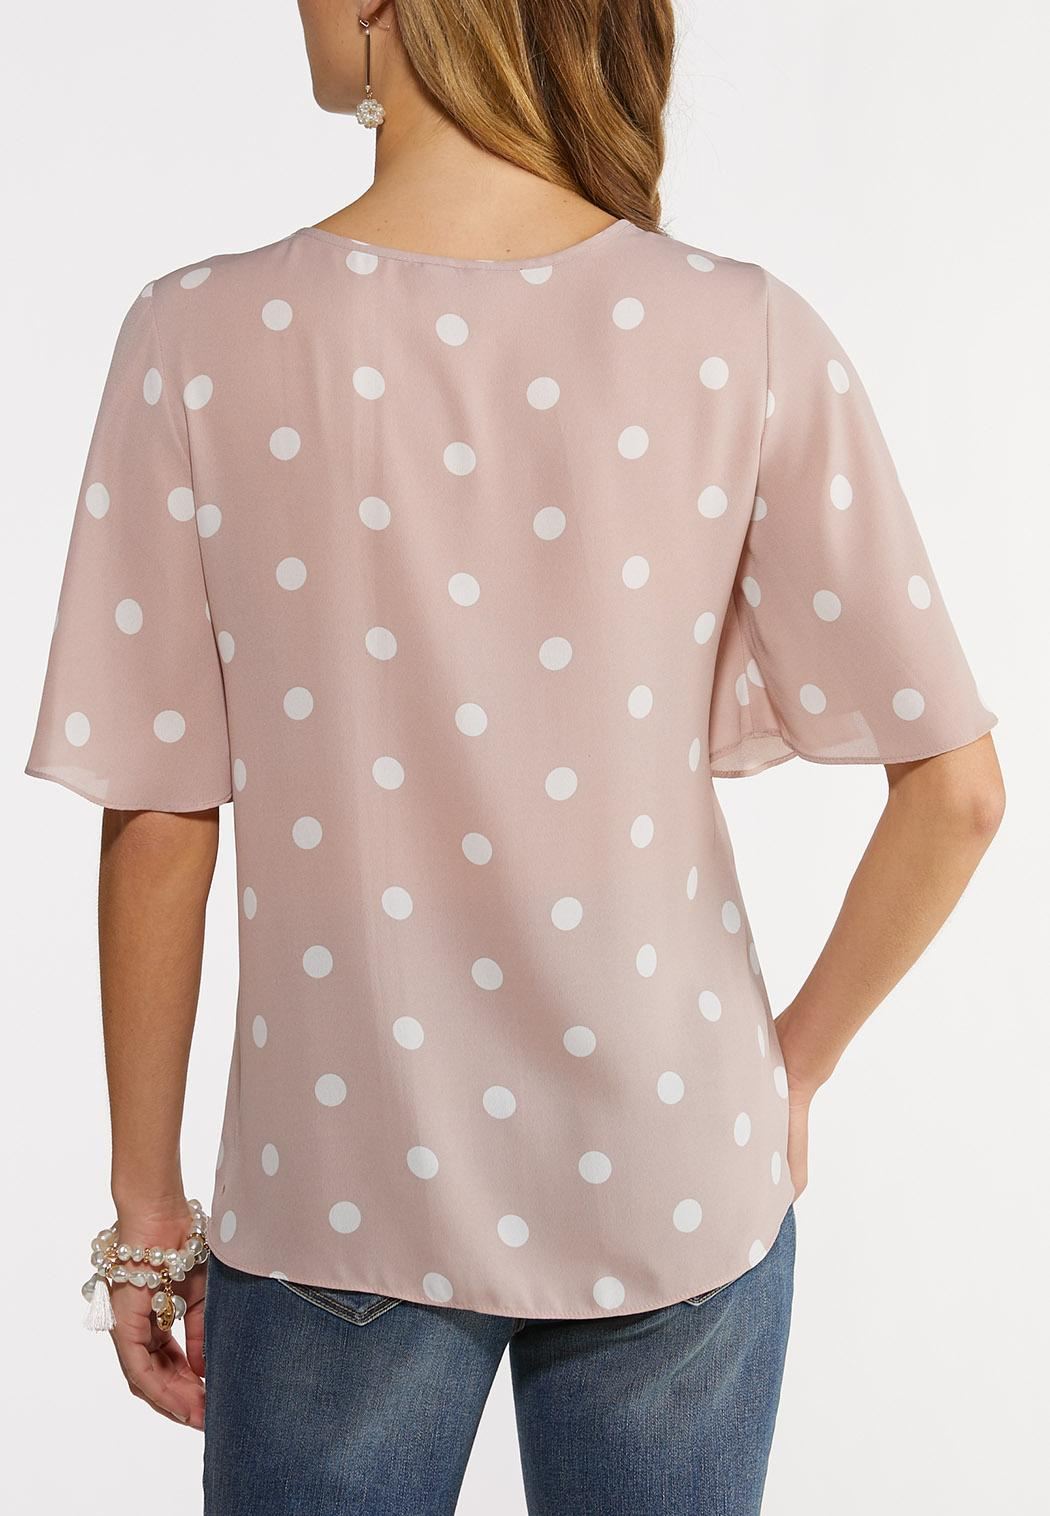 Polka Dot Button Top (Item #44185452)